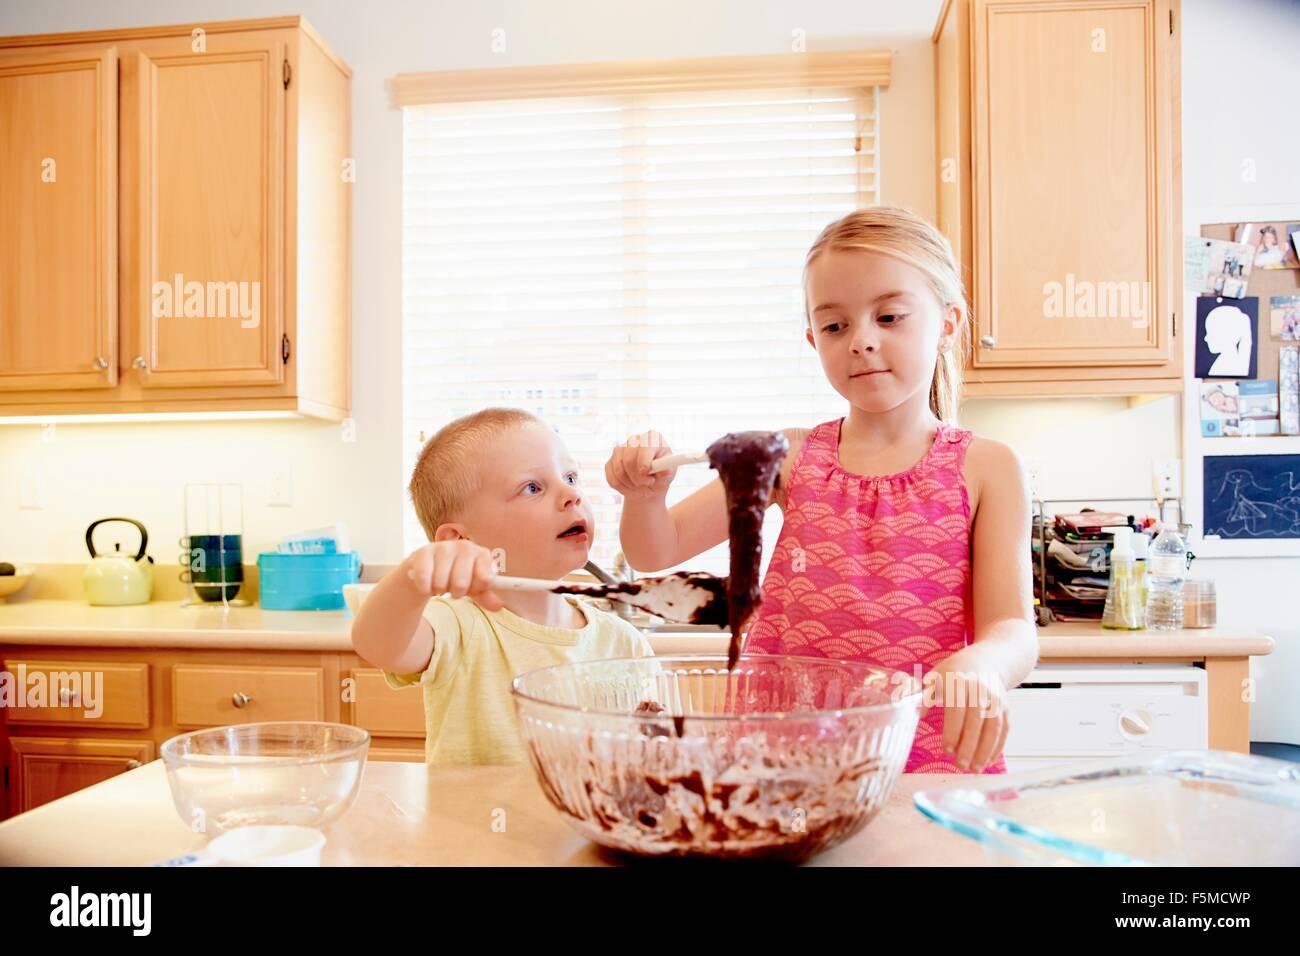 Siblings melting chocolate in mixing bowl - Stock Image